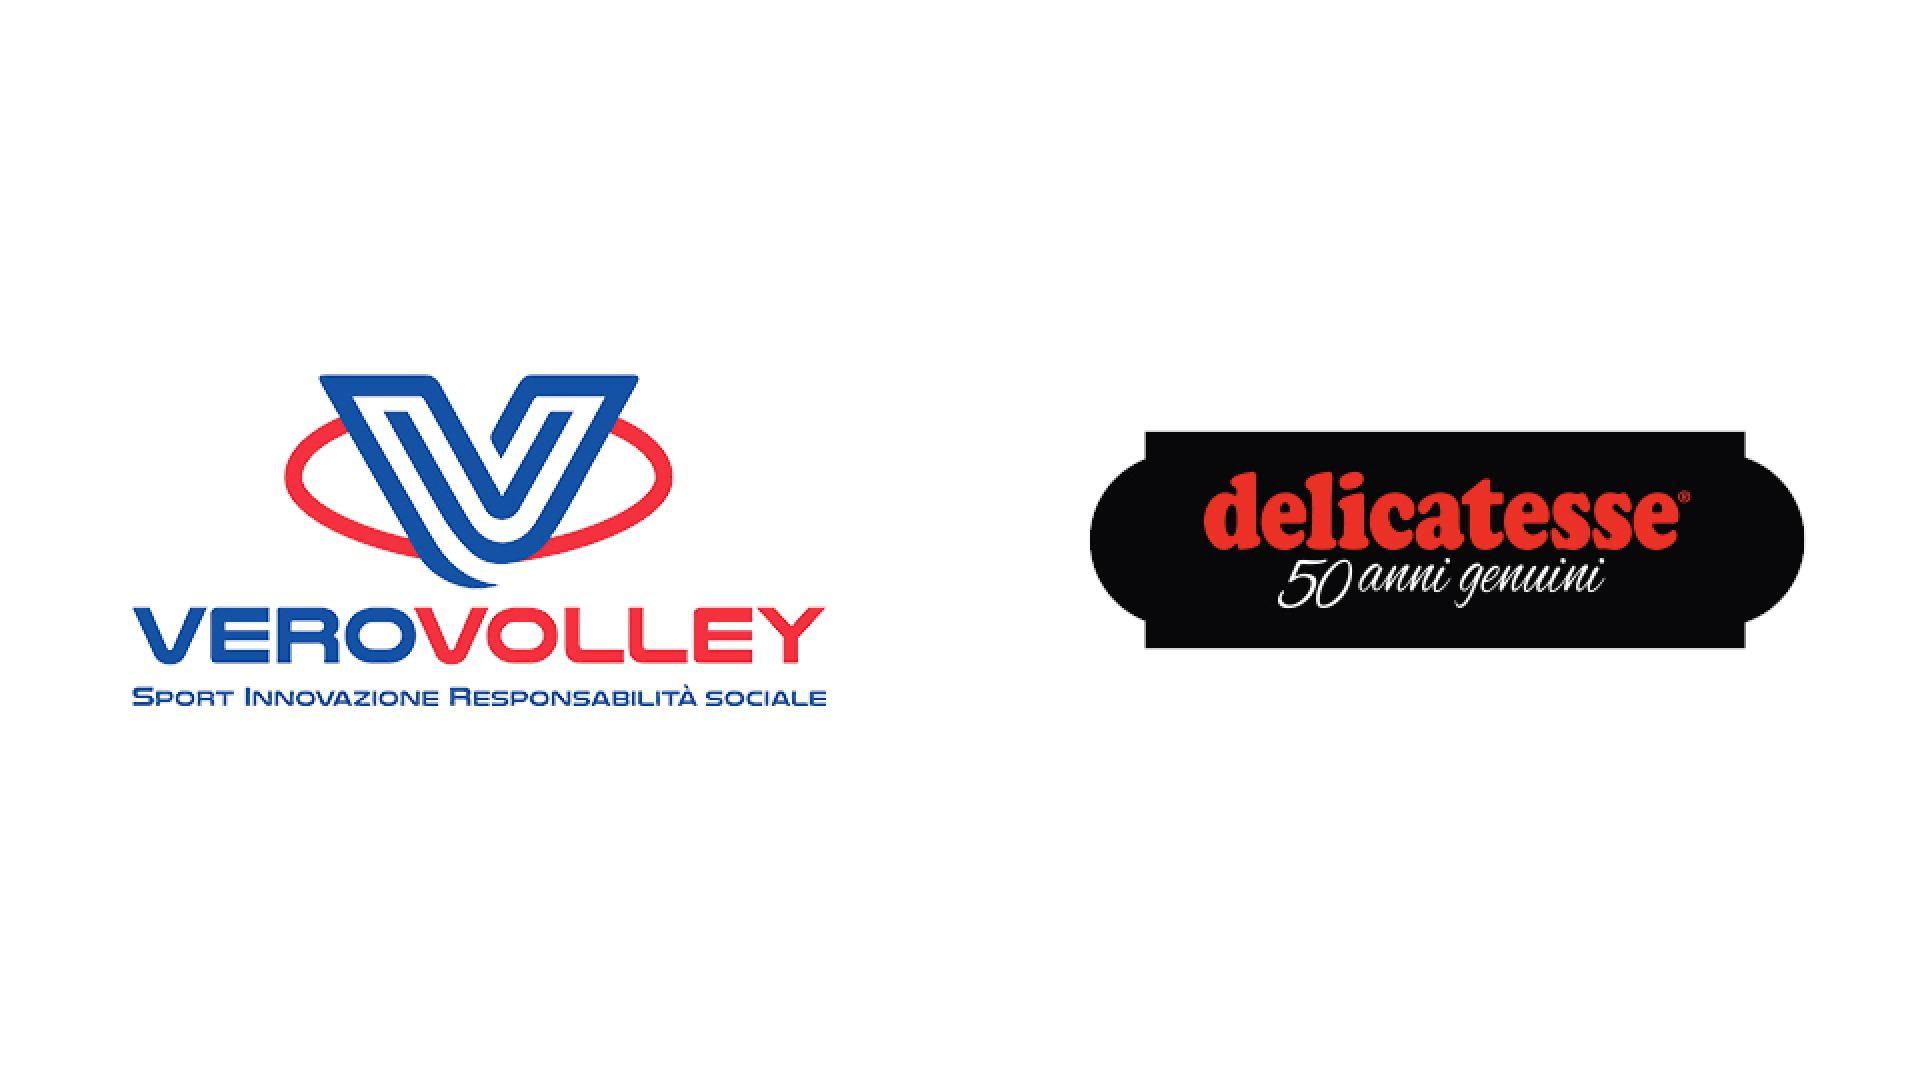 vv_delicatesse